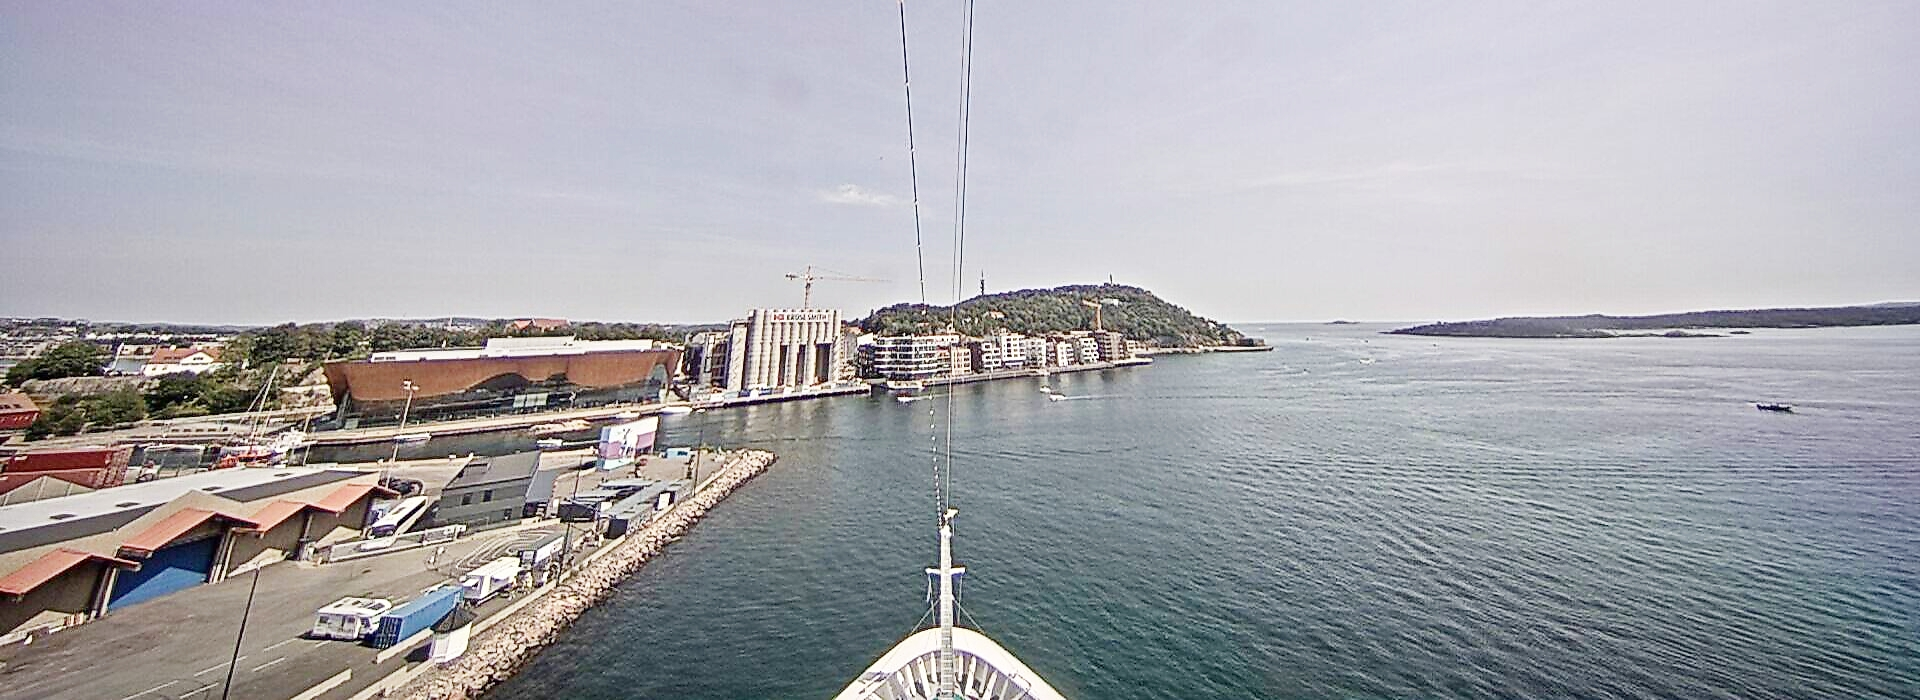 Webcam Panorama AIDAsol